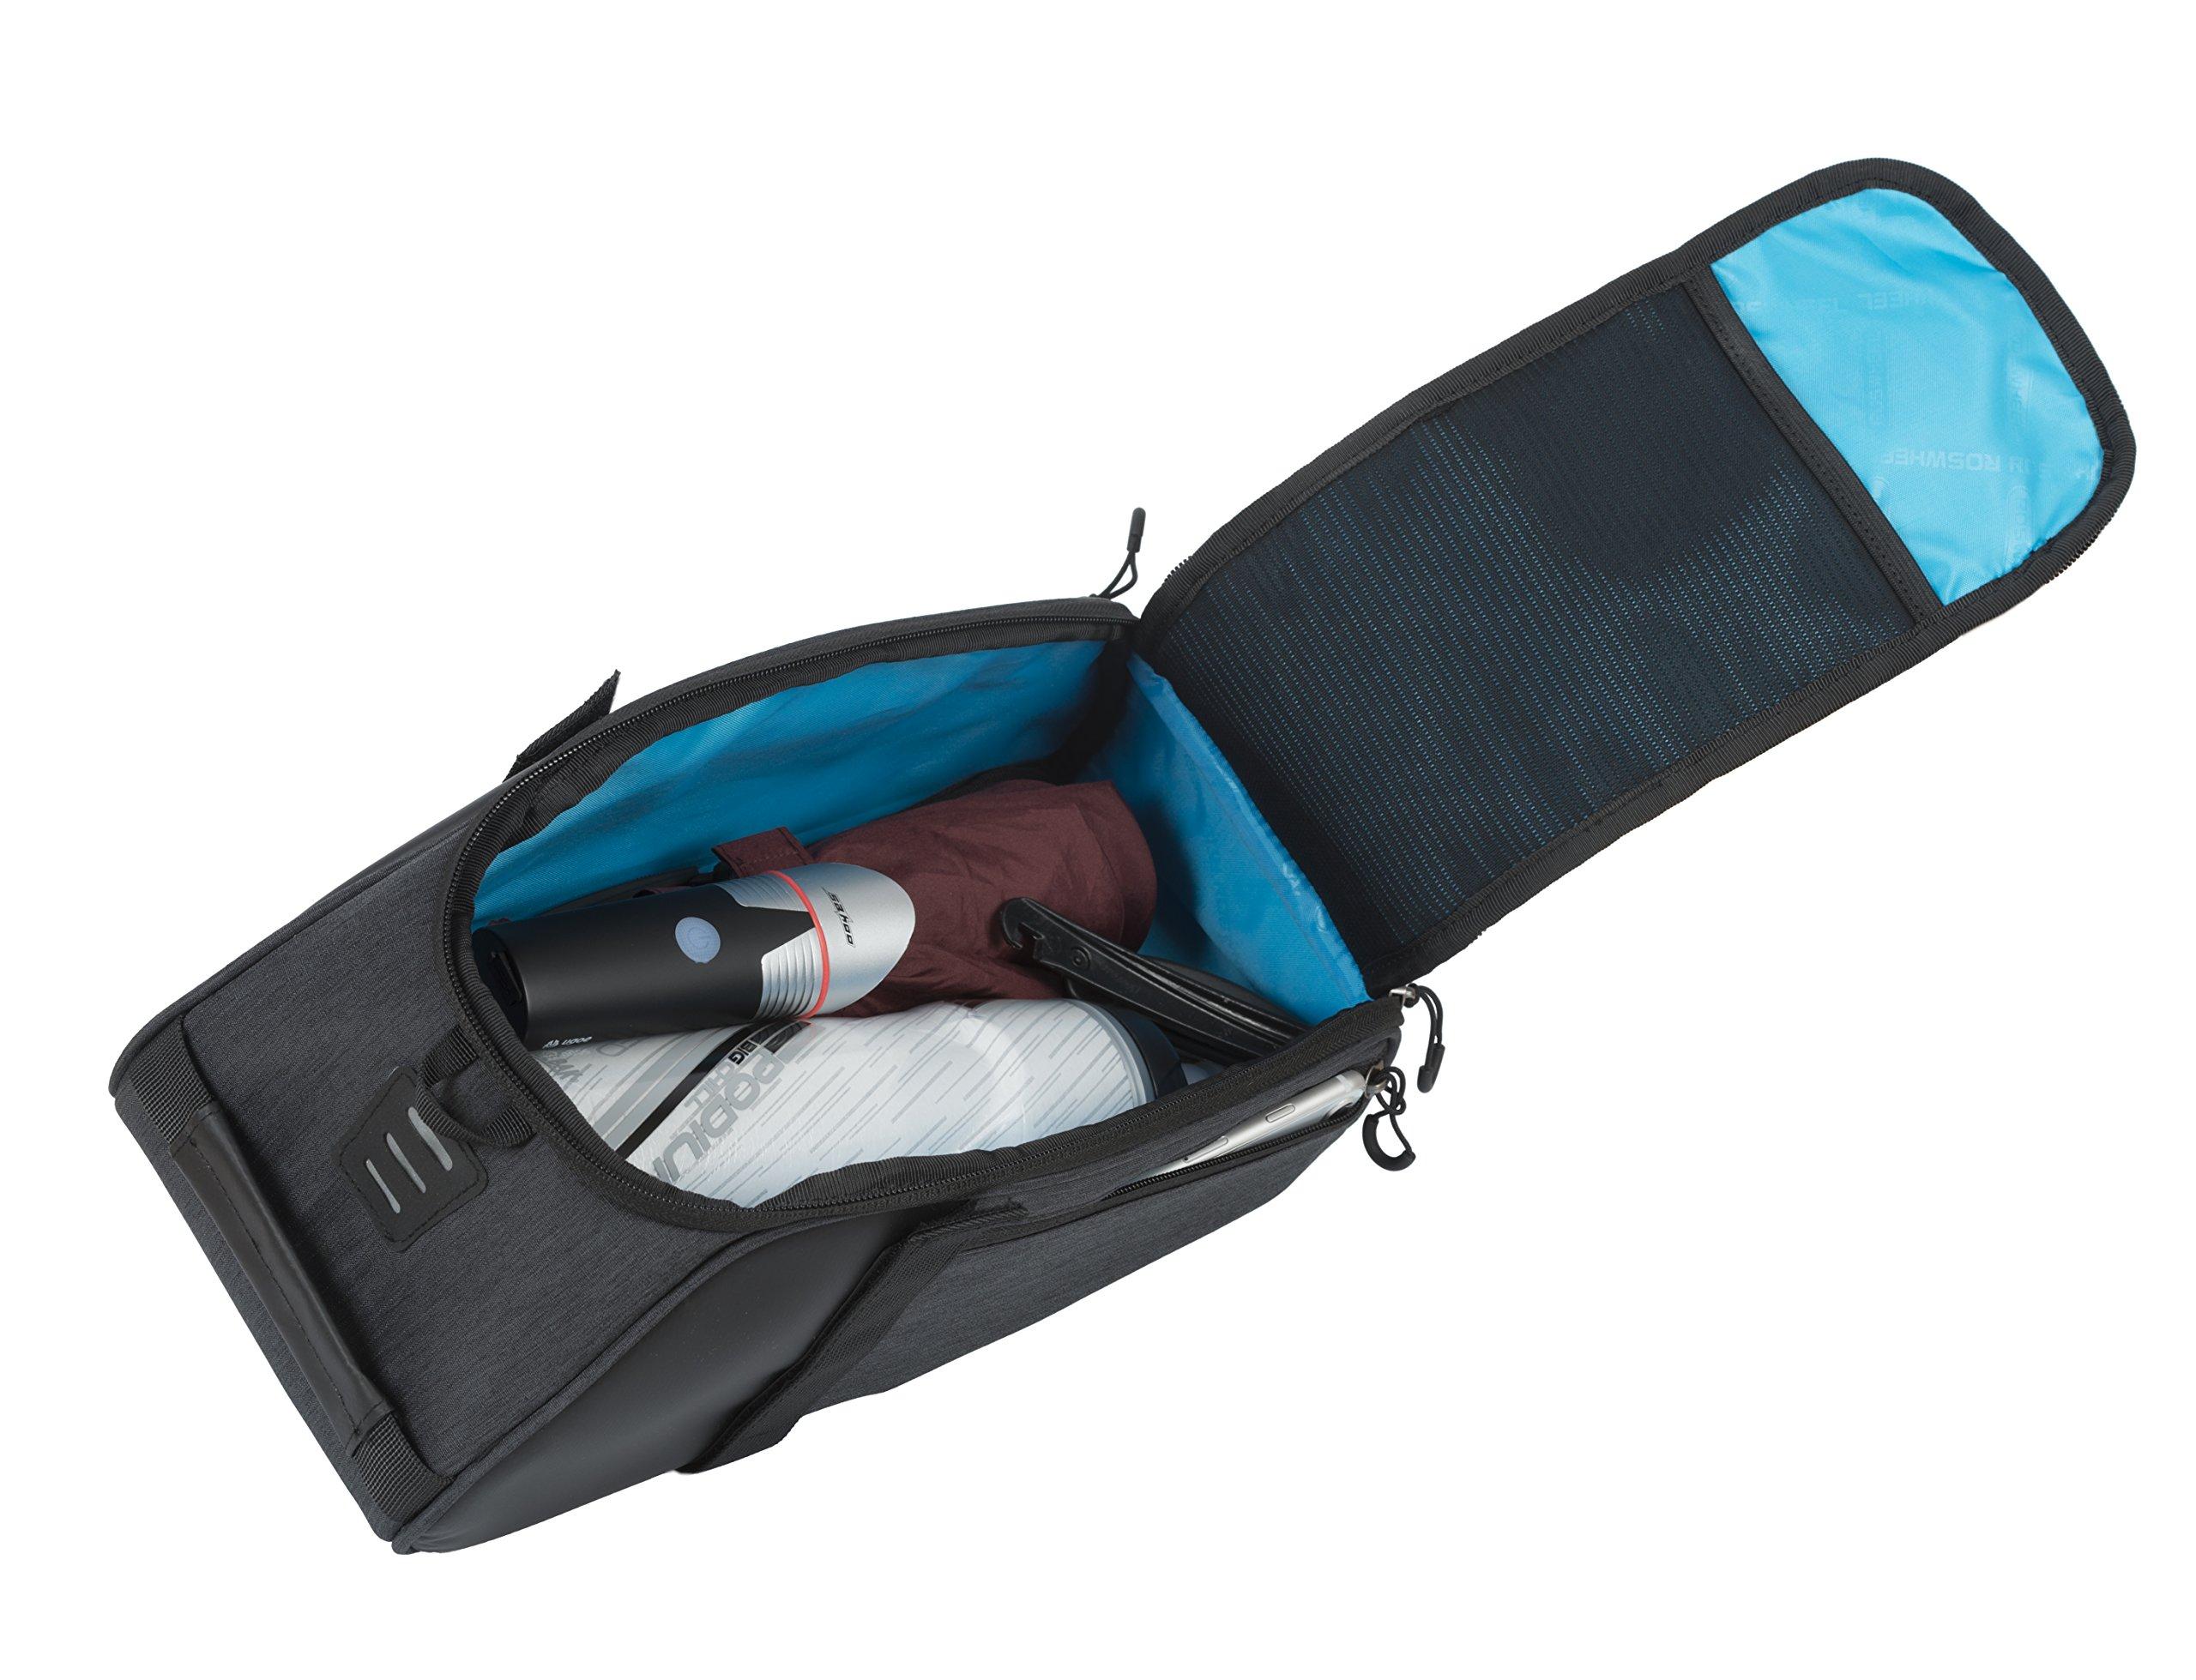 Roswheel Essentials Series 141466 Bike Trunk Bag Bicycle Rear Rack Pack Cycling Accessories Pannier, 8L Capacity by Roswheel (Image #5)